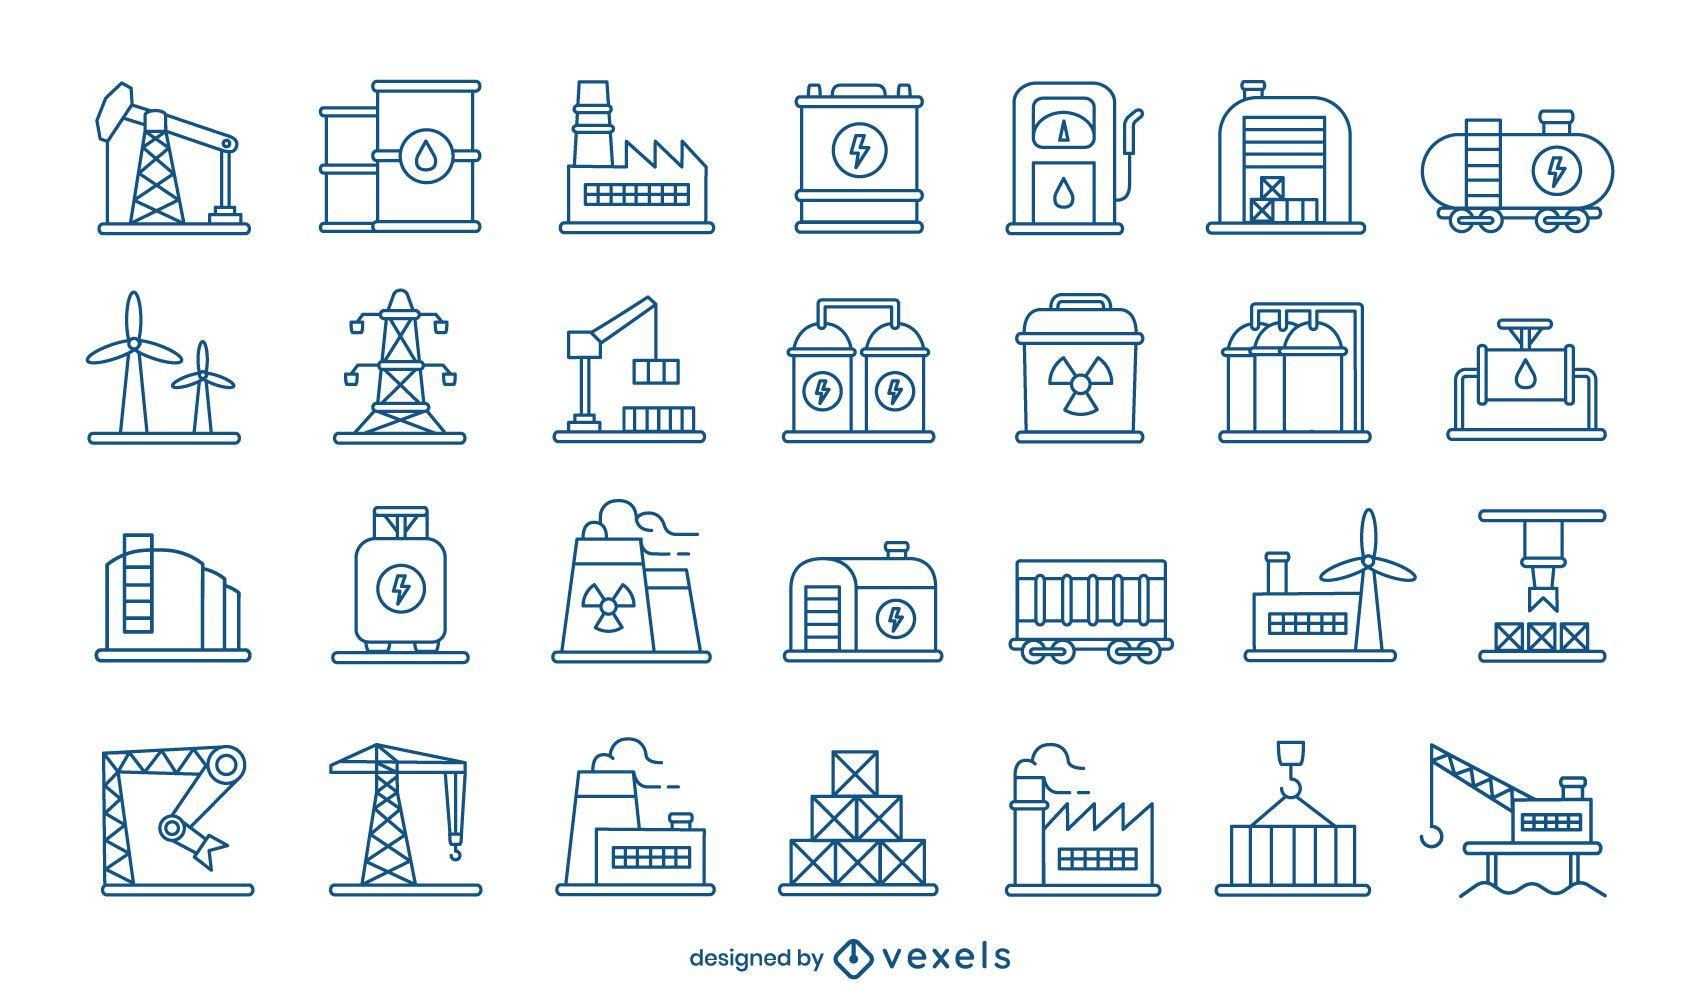 Industry icon stroke set